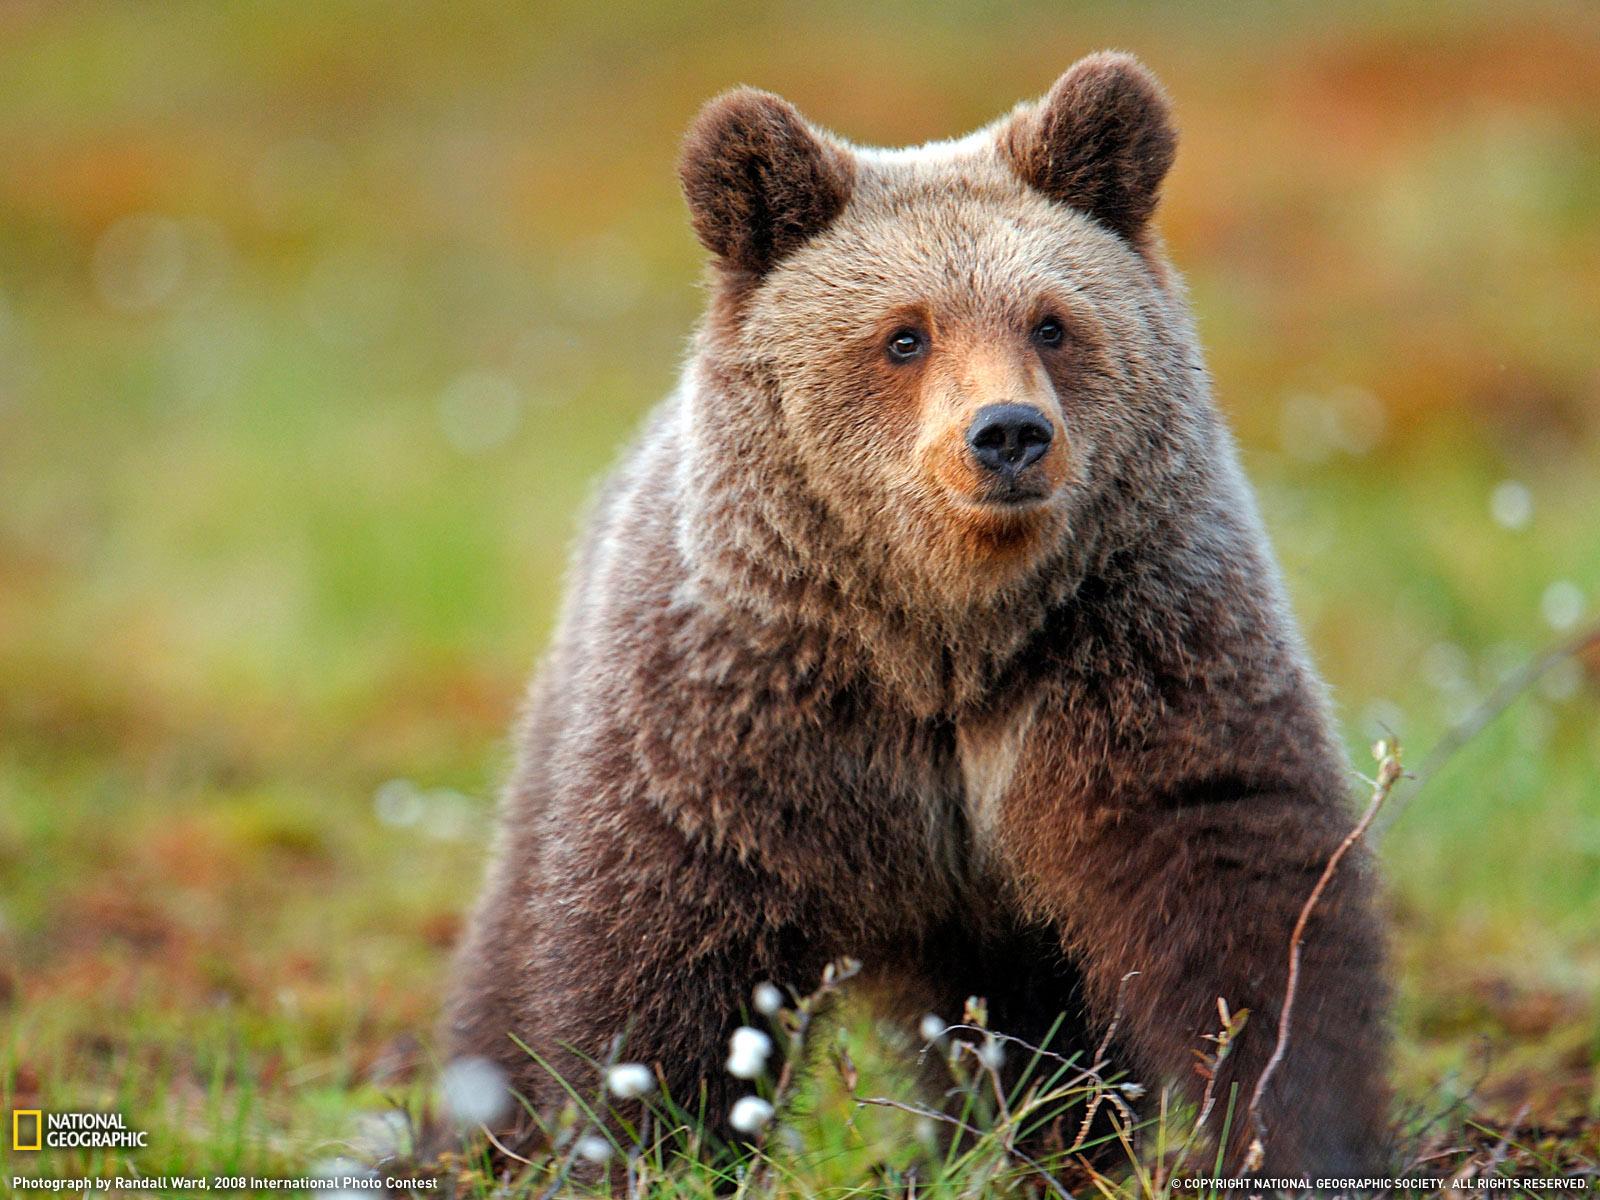 Veganismo racional debemos intervenir en la naturaleza - National geographic wild wallpapers ...